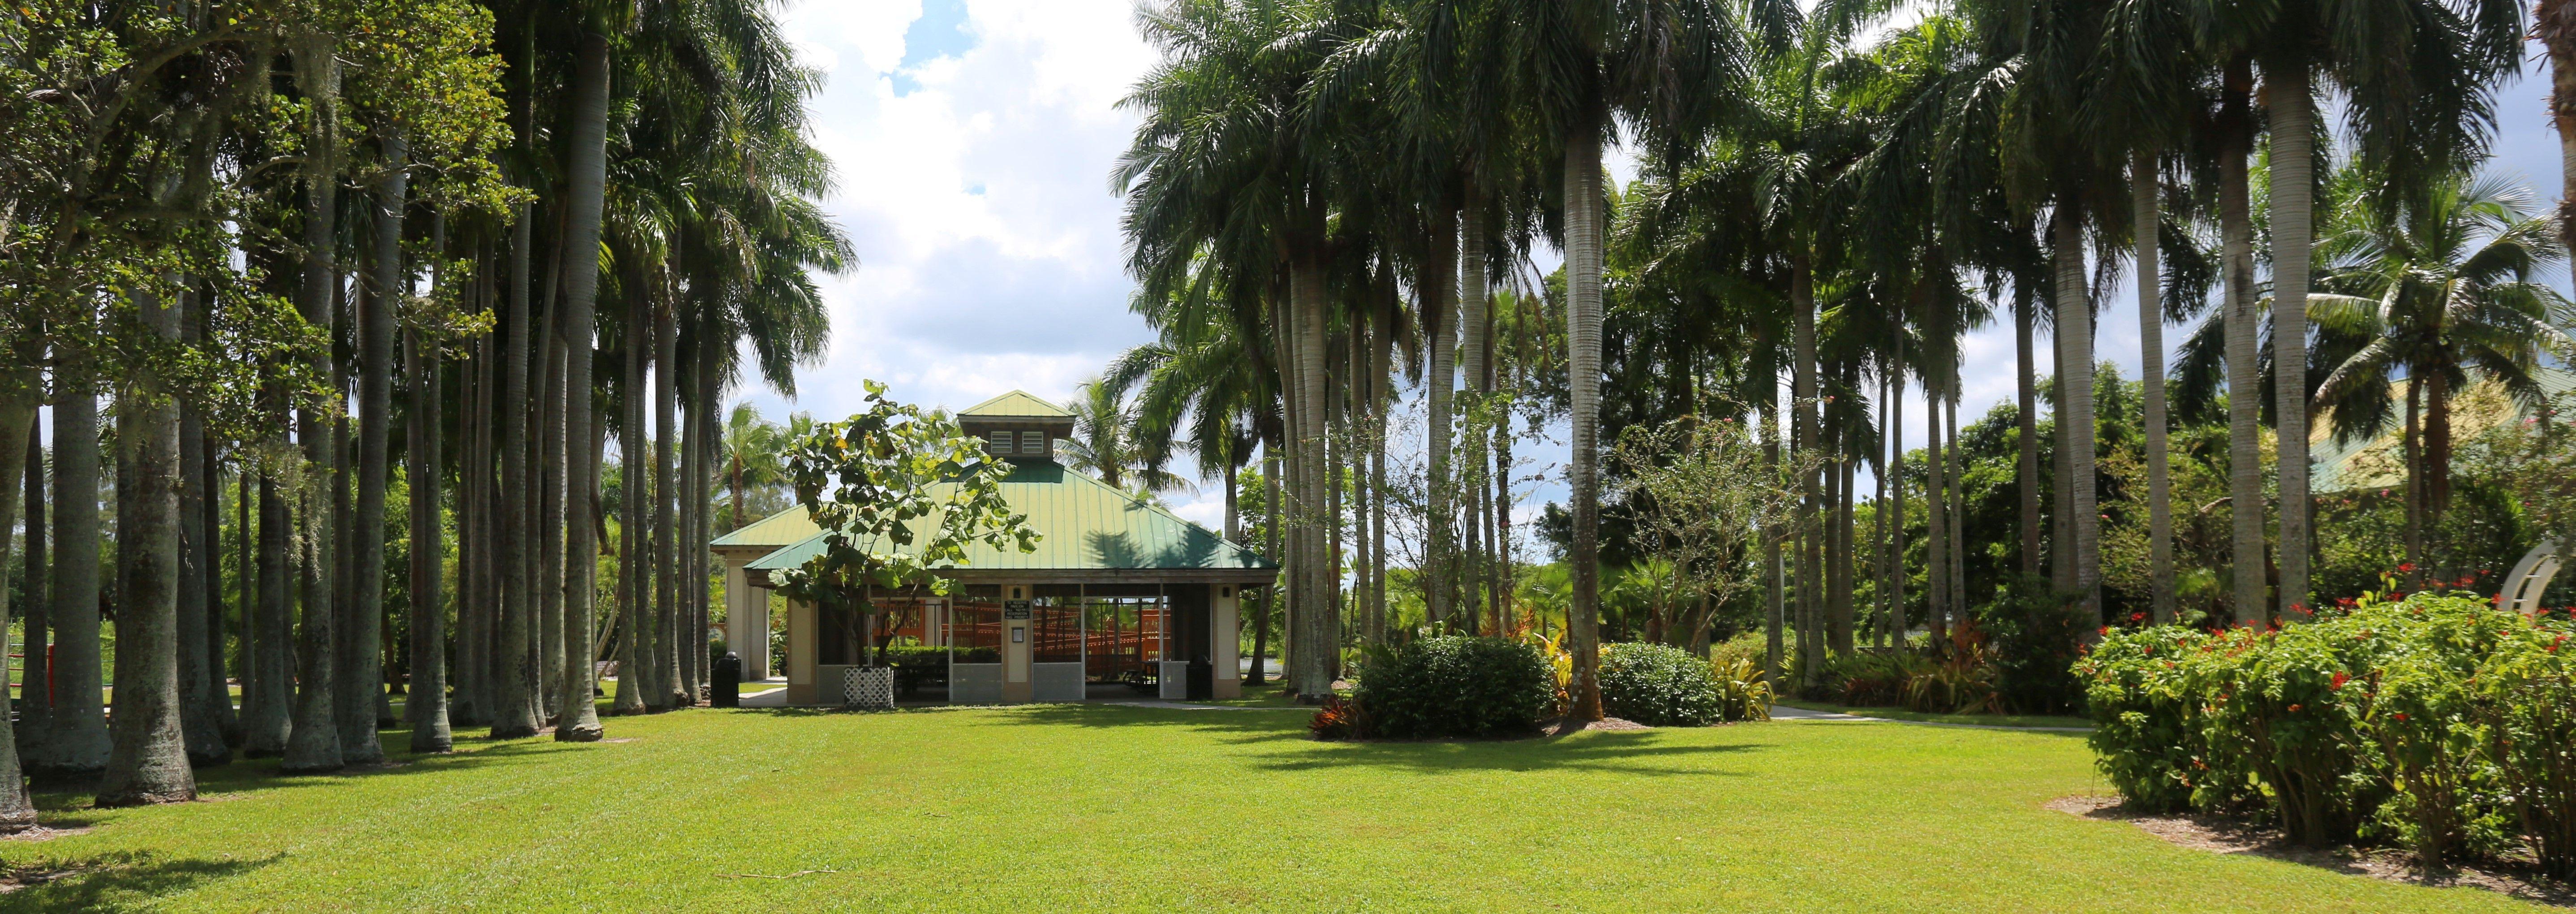 Palma Sola Botanical Park Where Florida S Beauty Remains Timeless